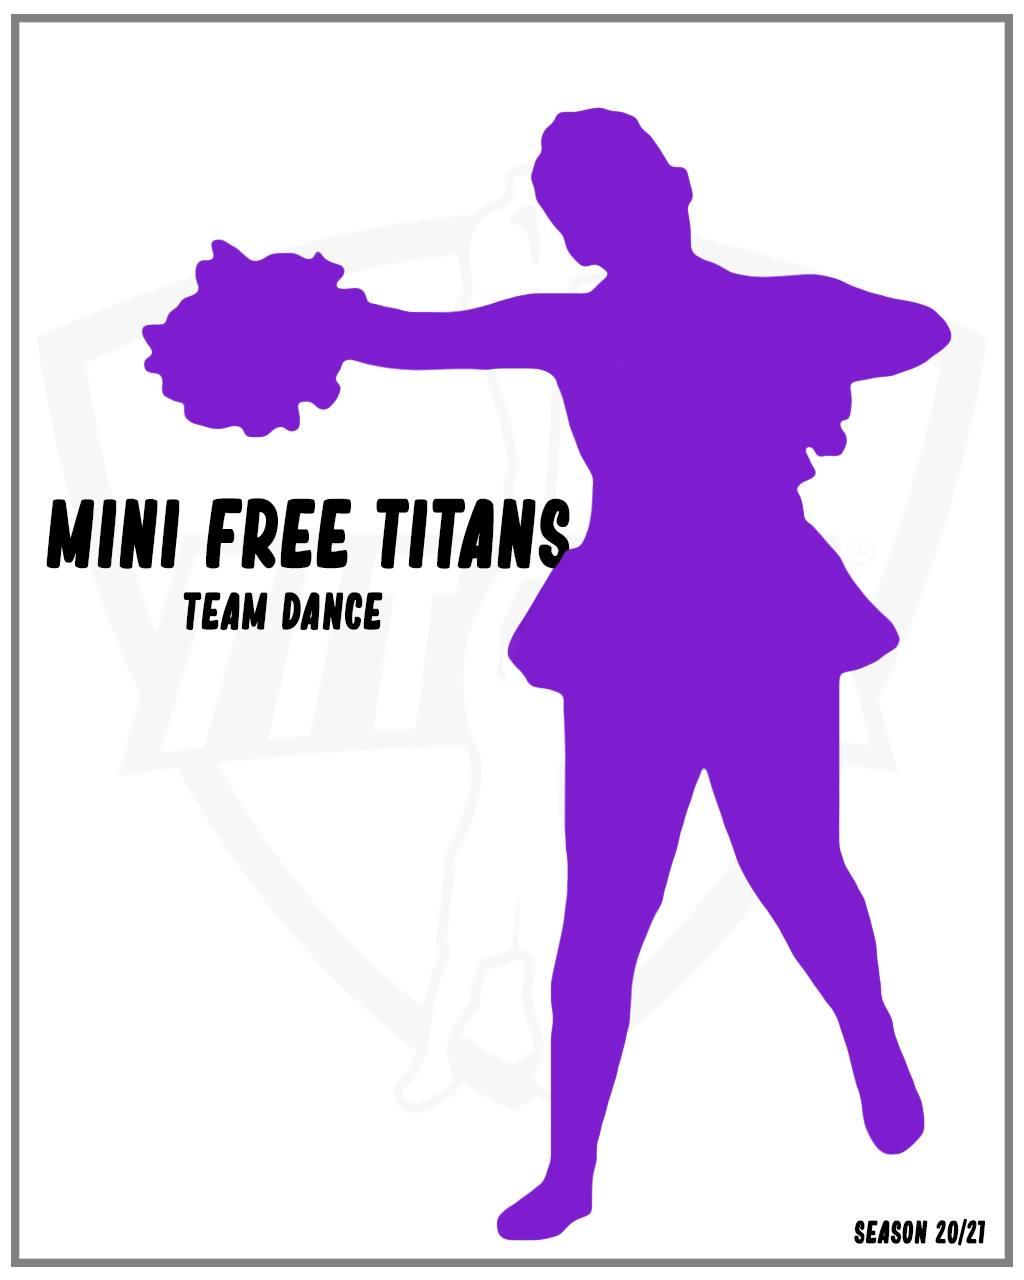 Mini Free Titans